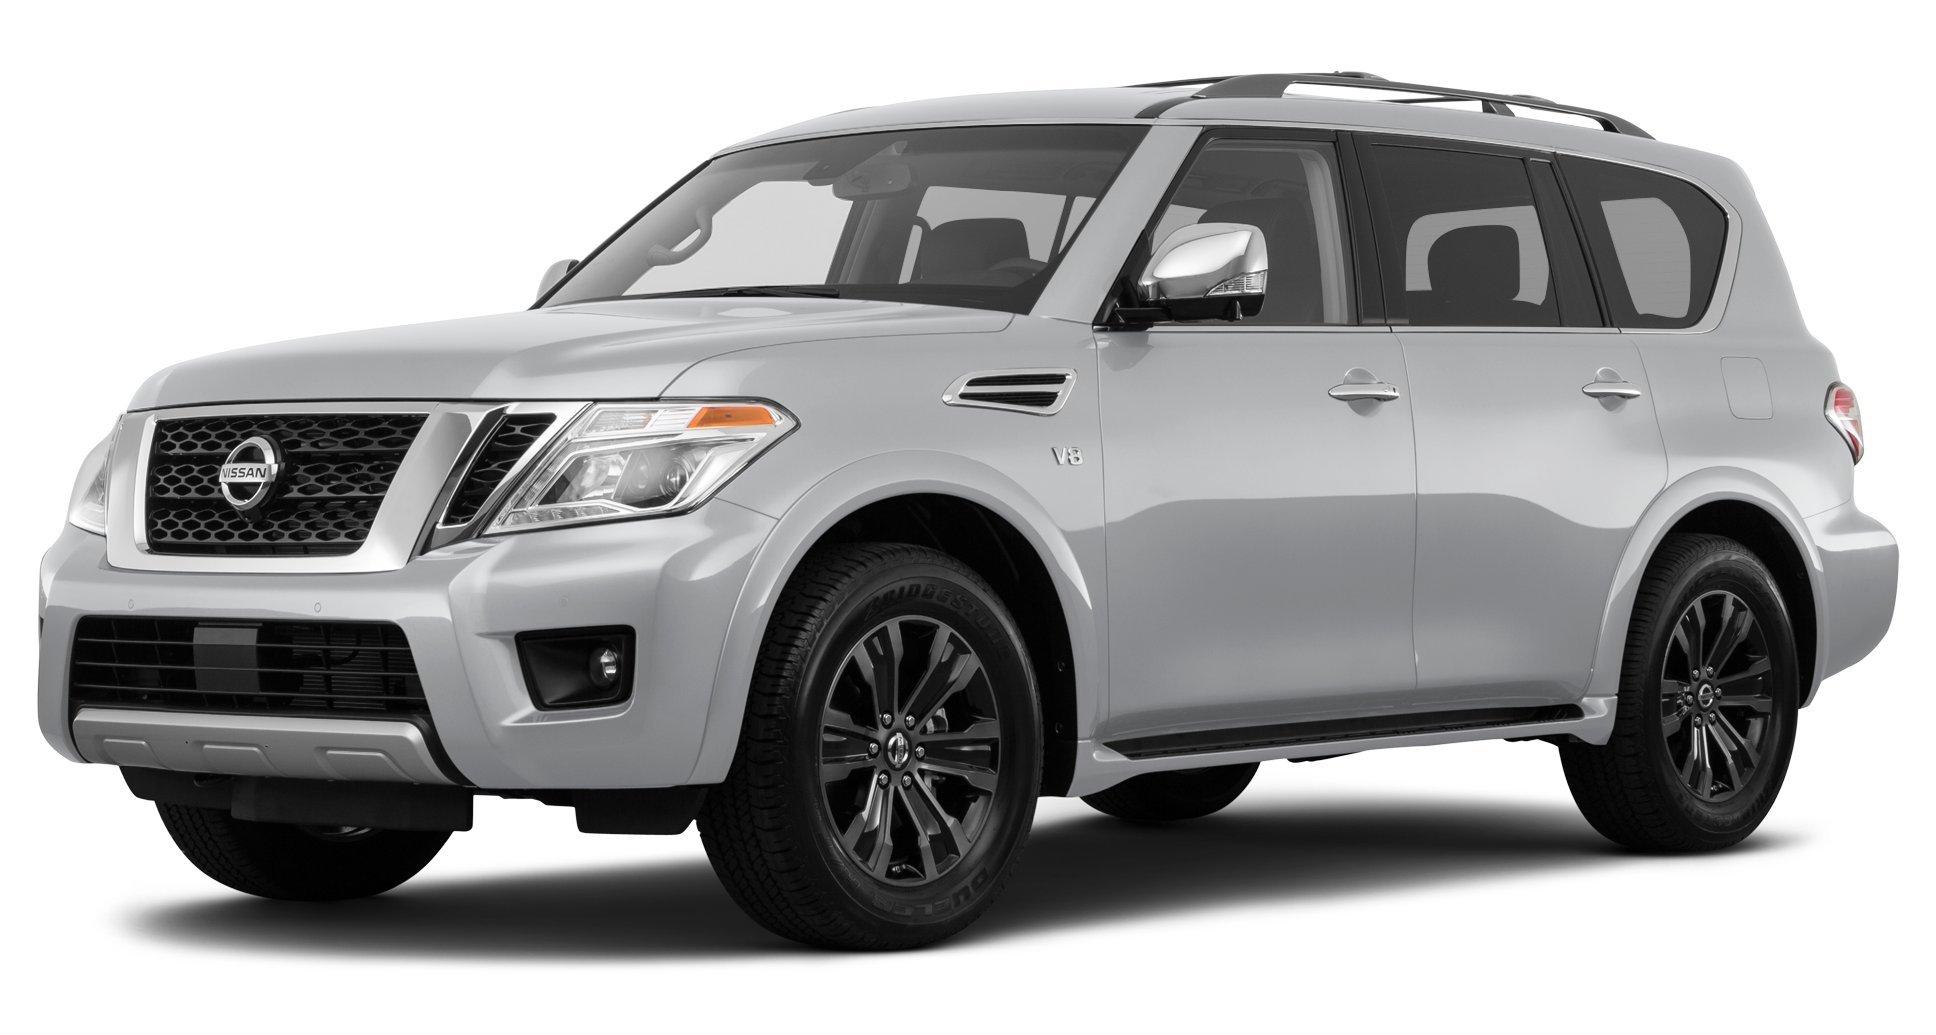 2017 Nissan Armada Configurations >> 2017 Nissan Armada